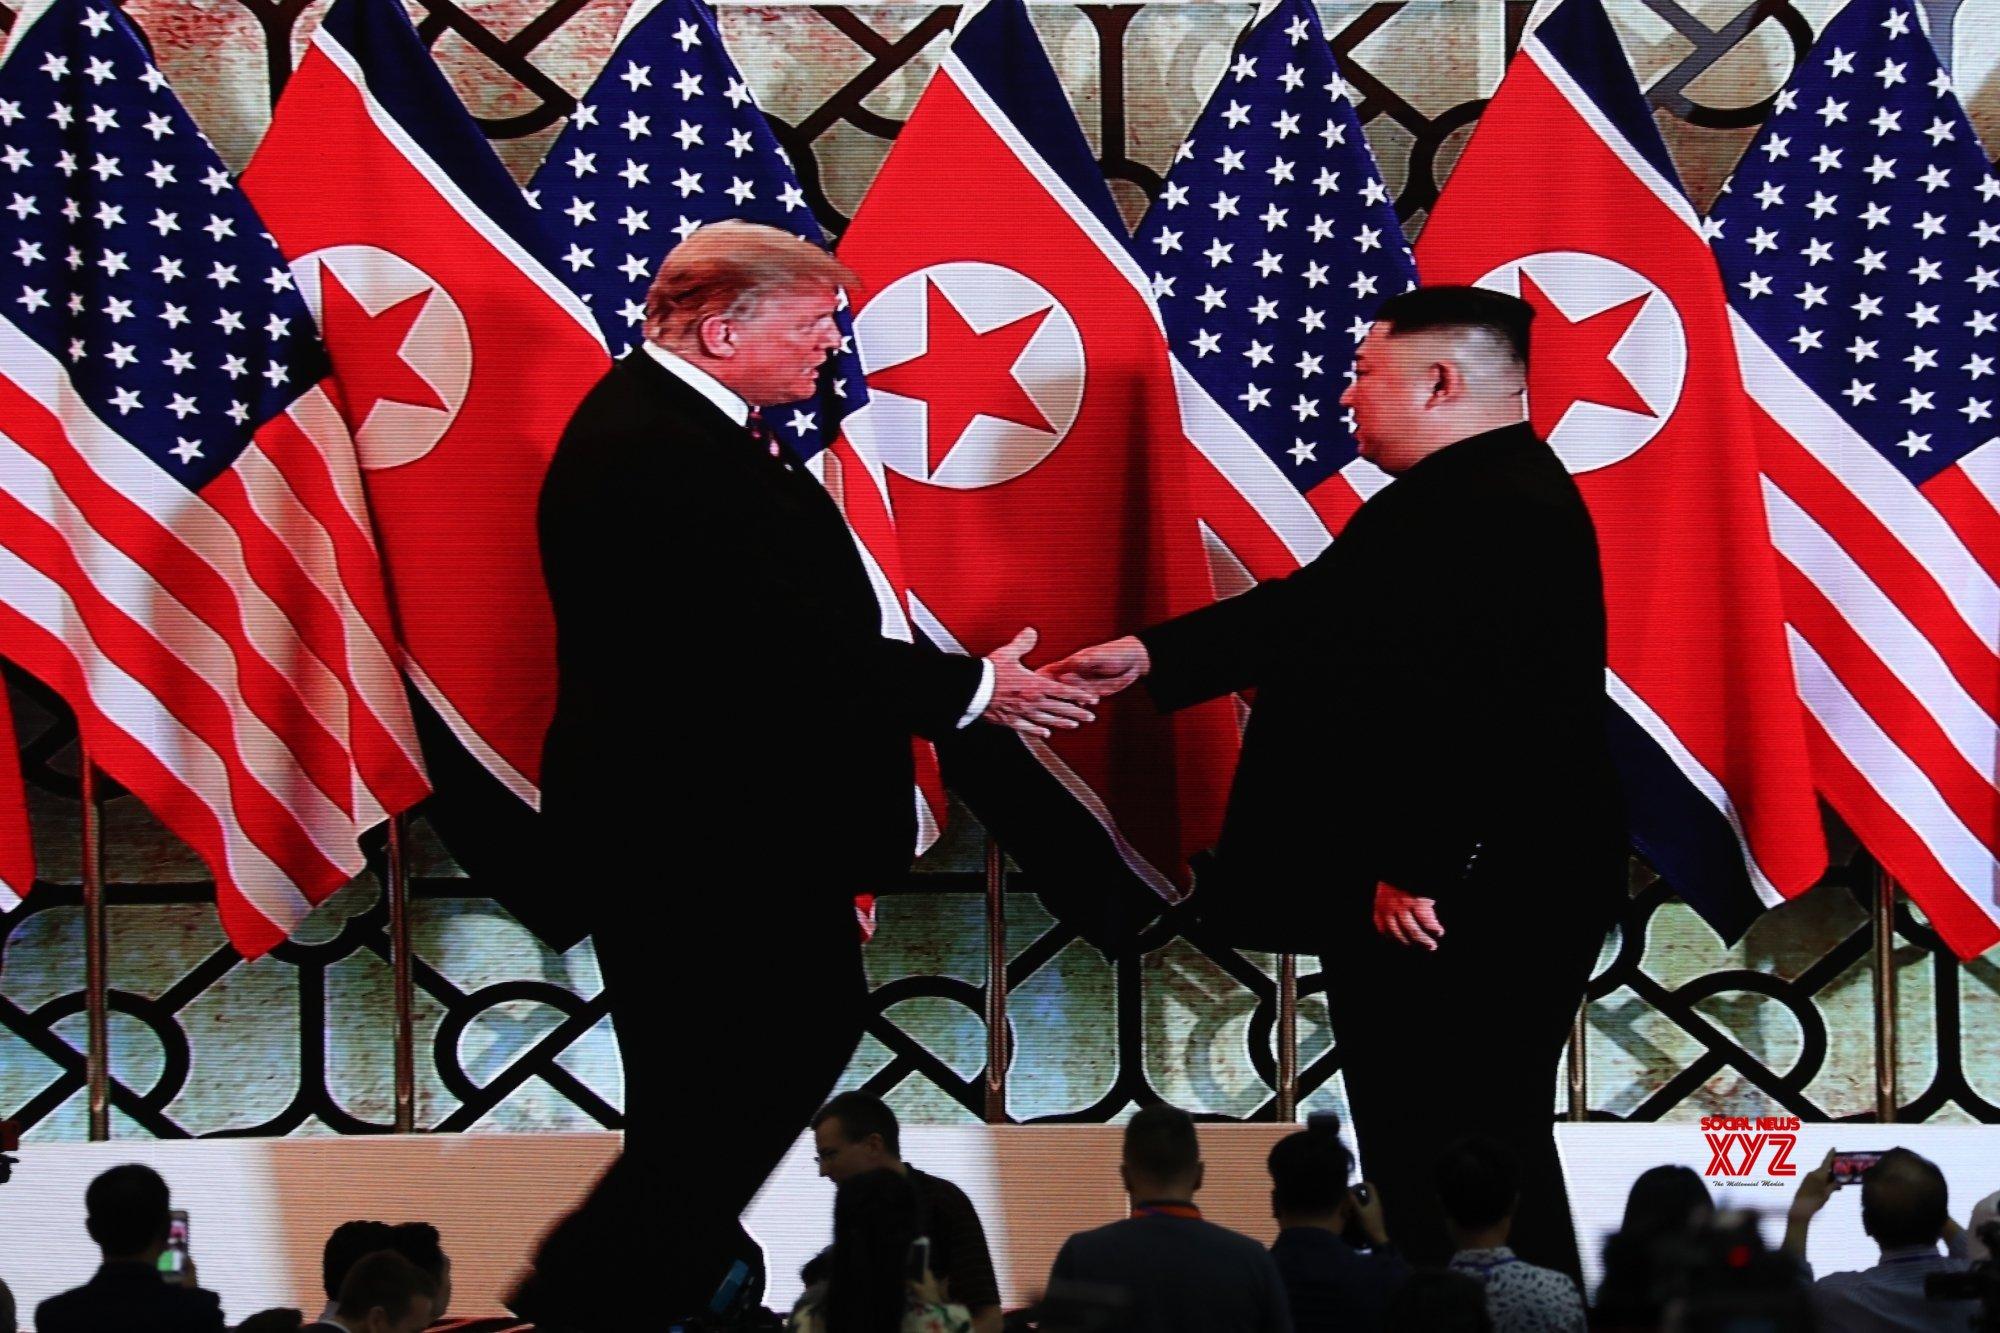 'Moon expects Trump to meet Kim Jong-un before Nov polls'